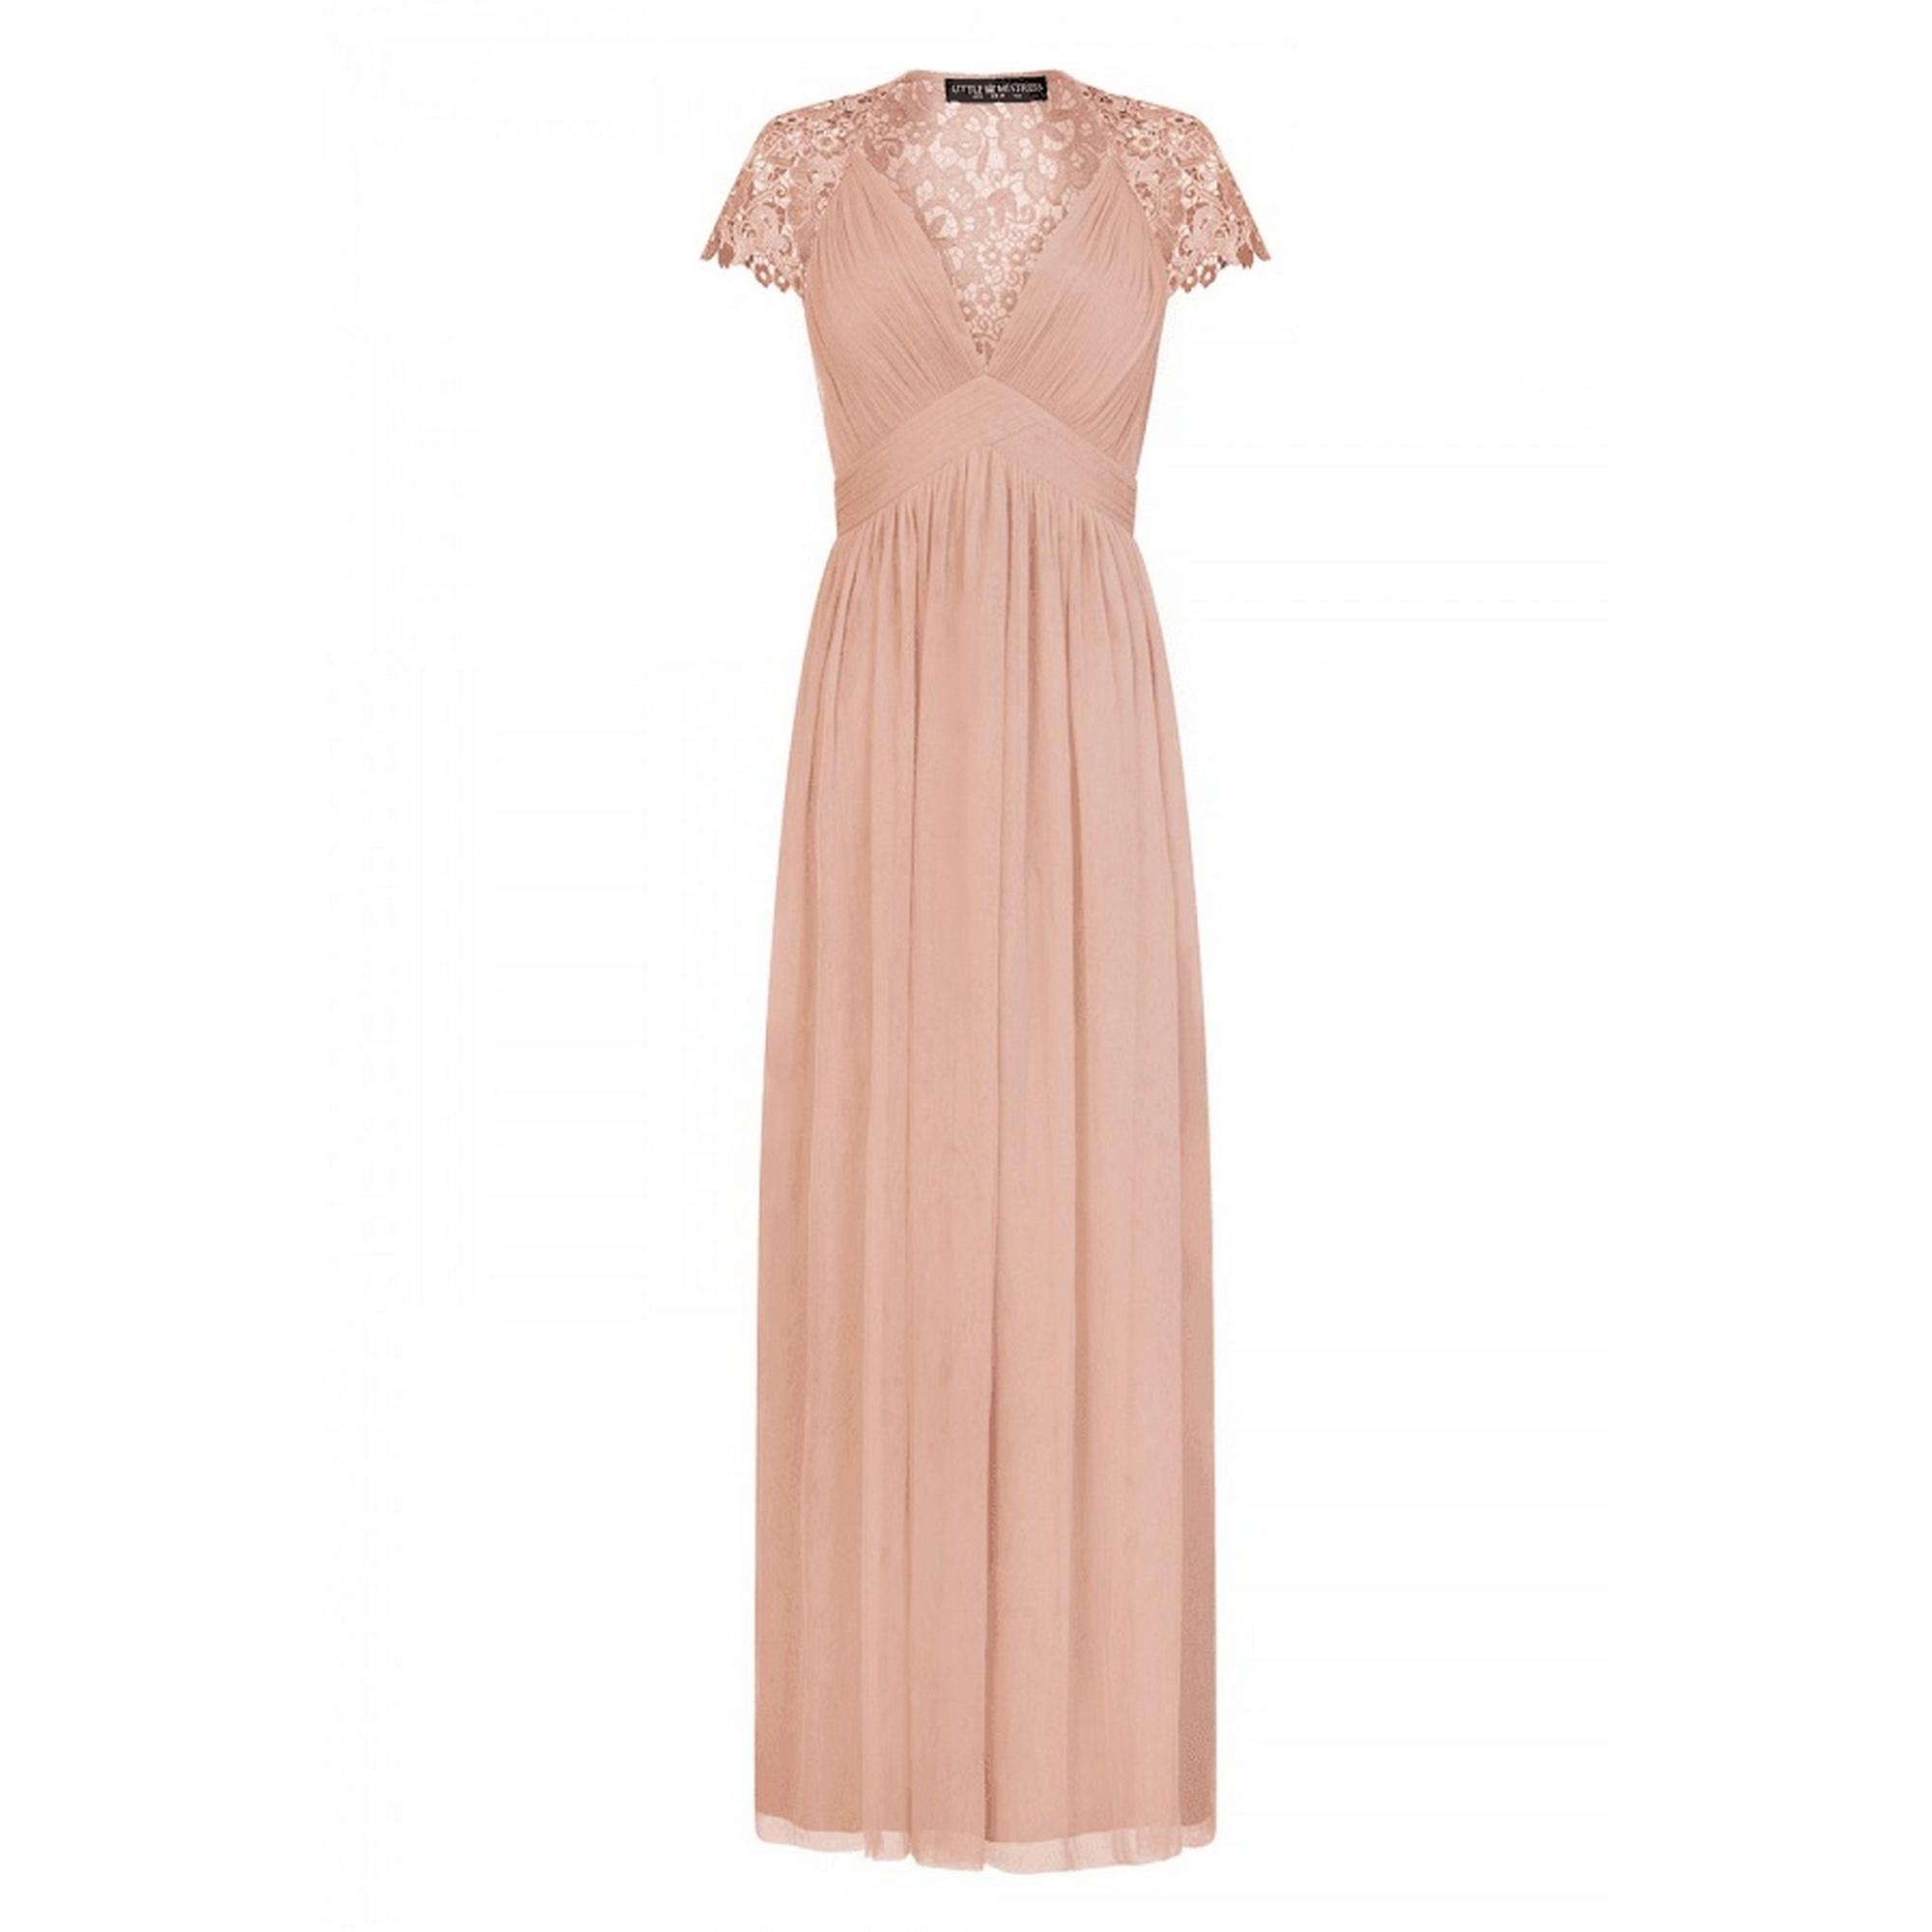 Little Mistress Womens/Ladies Embellished Cap Sleeve Maxi Dress (12 UK) (Pink)